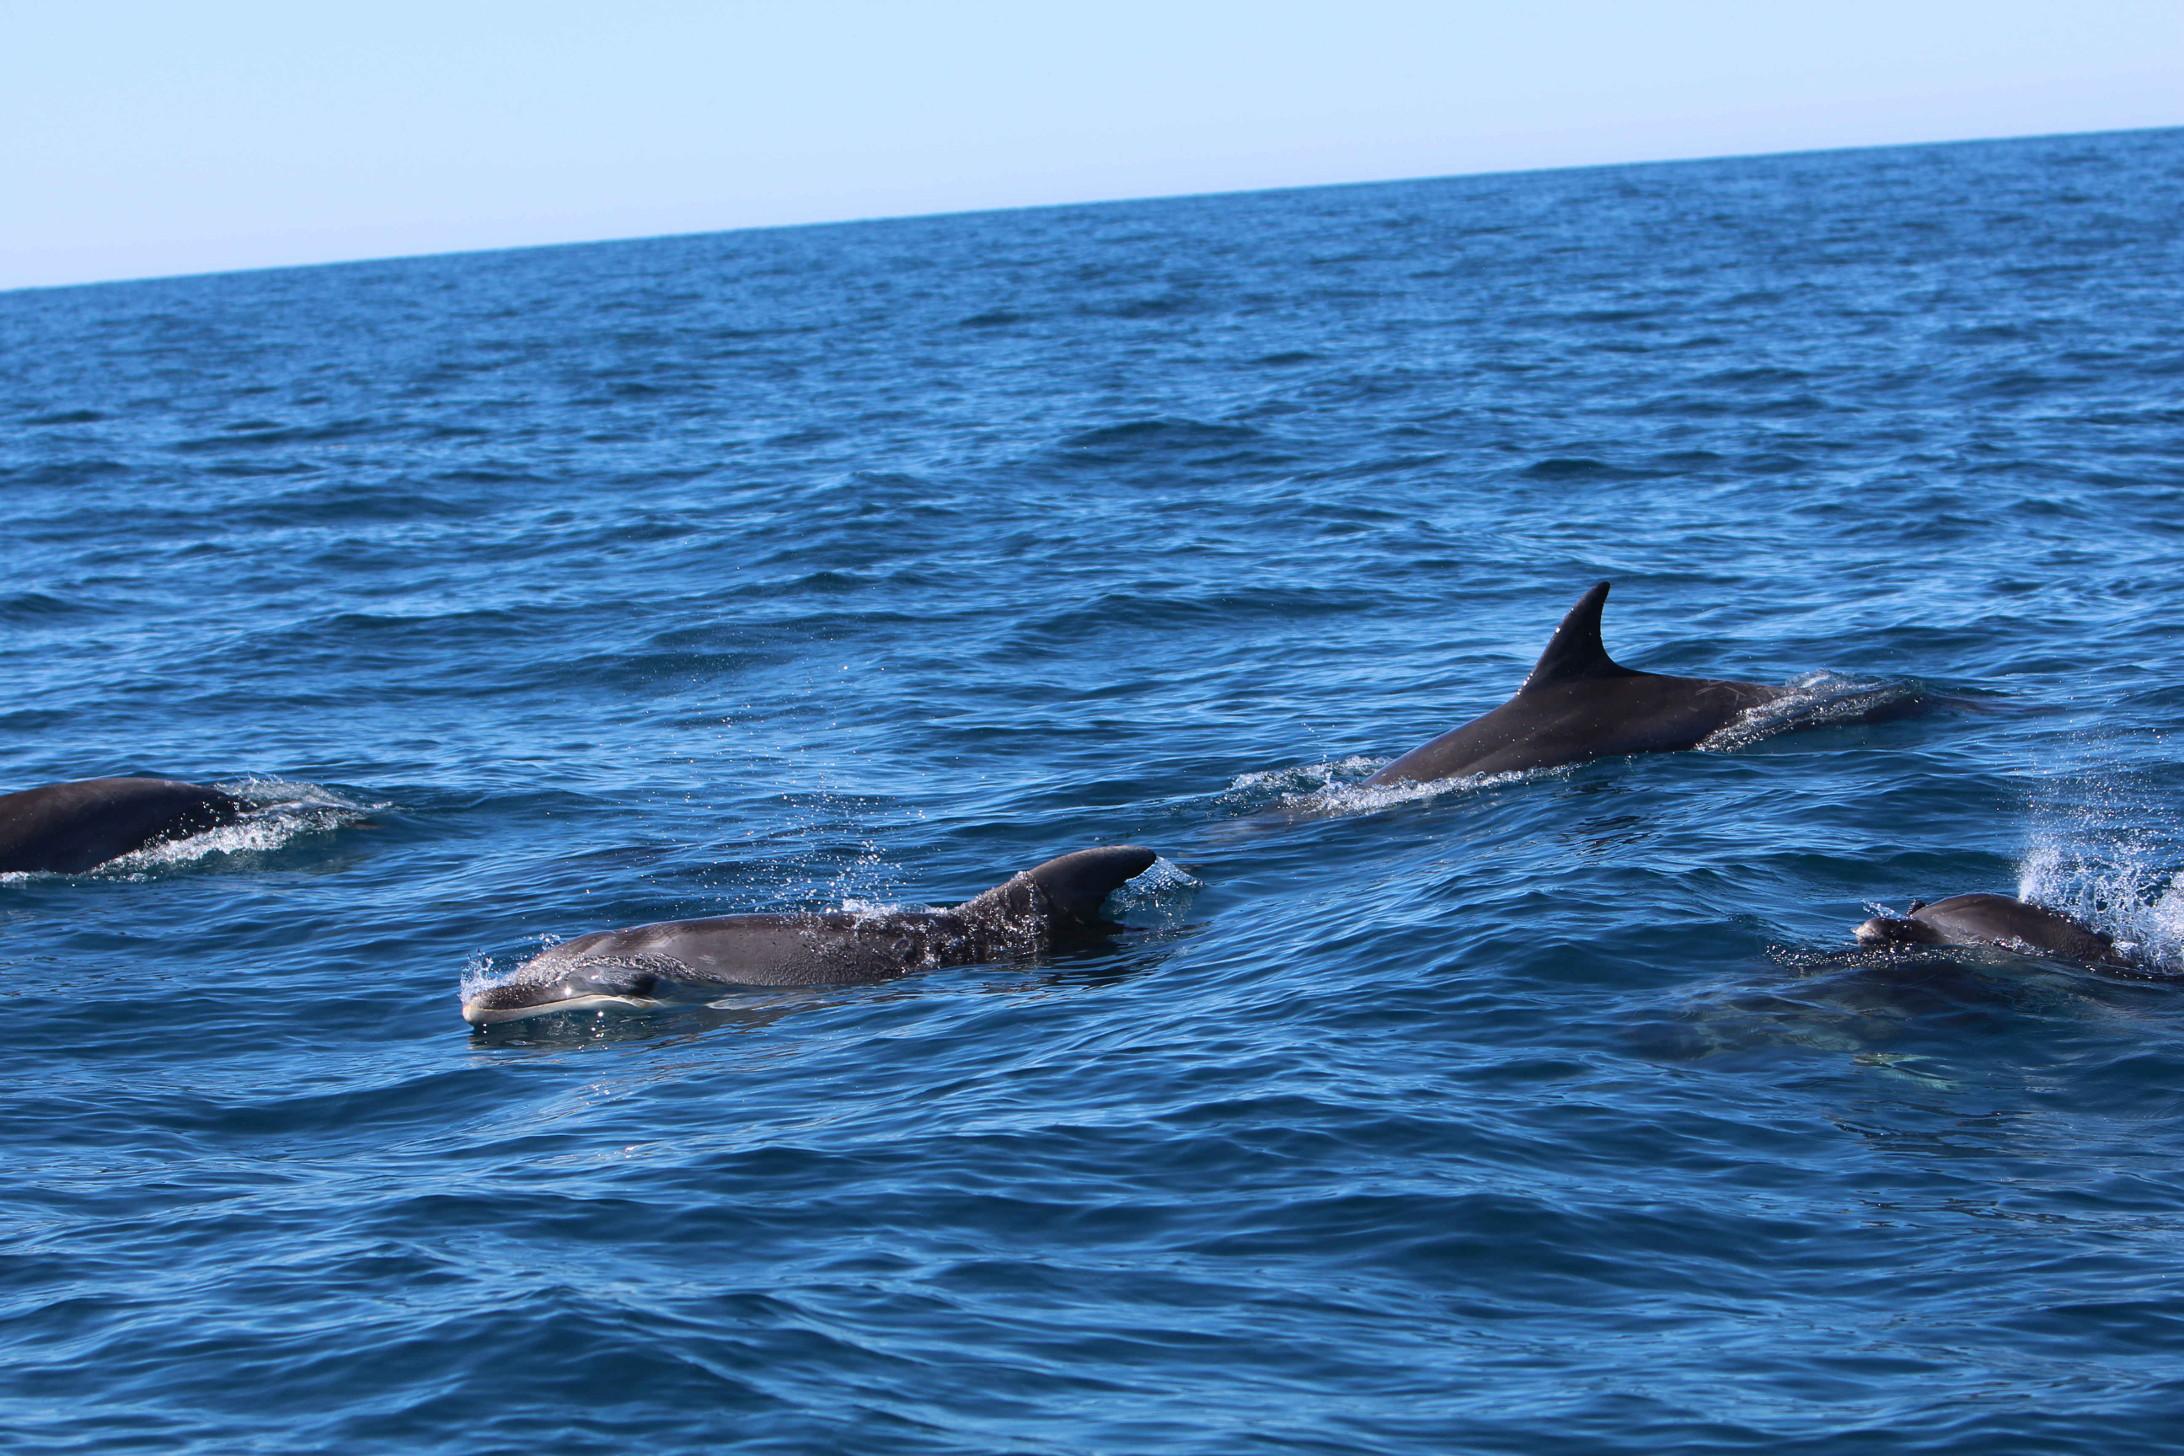 Un grupo de delfines mulares por Columbretes. Imagen de archivo: Generalitat Valenciana